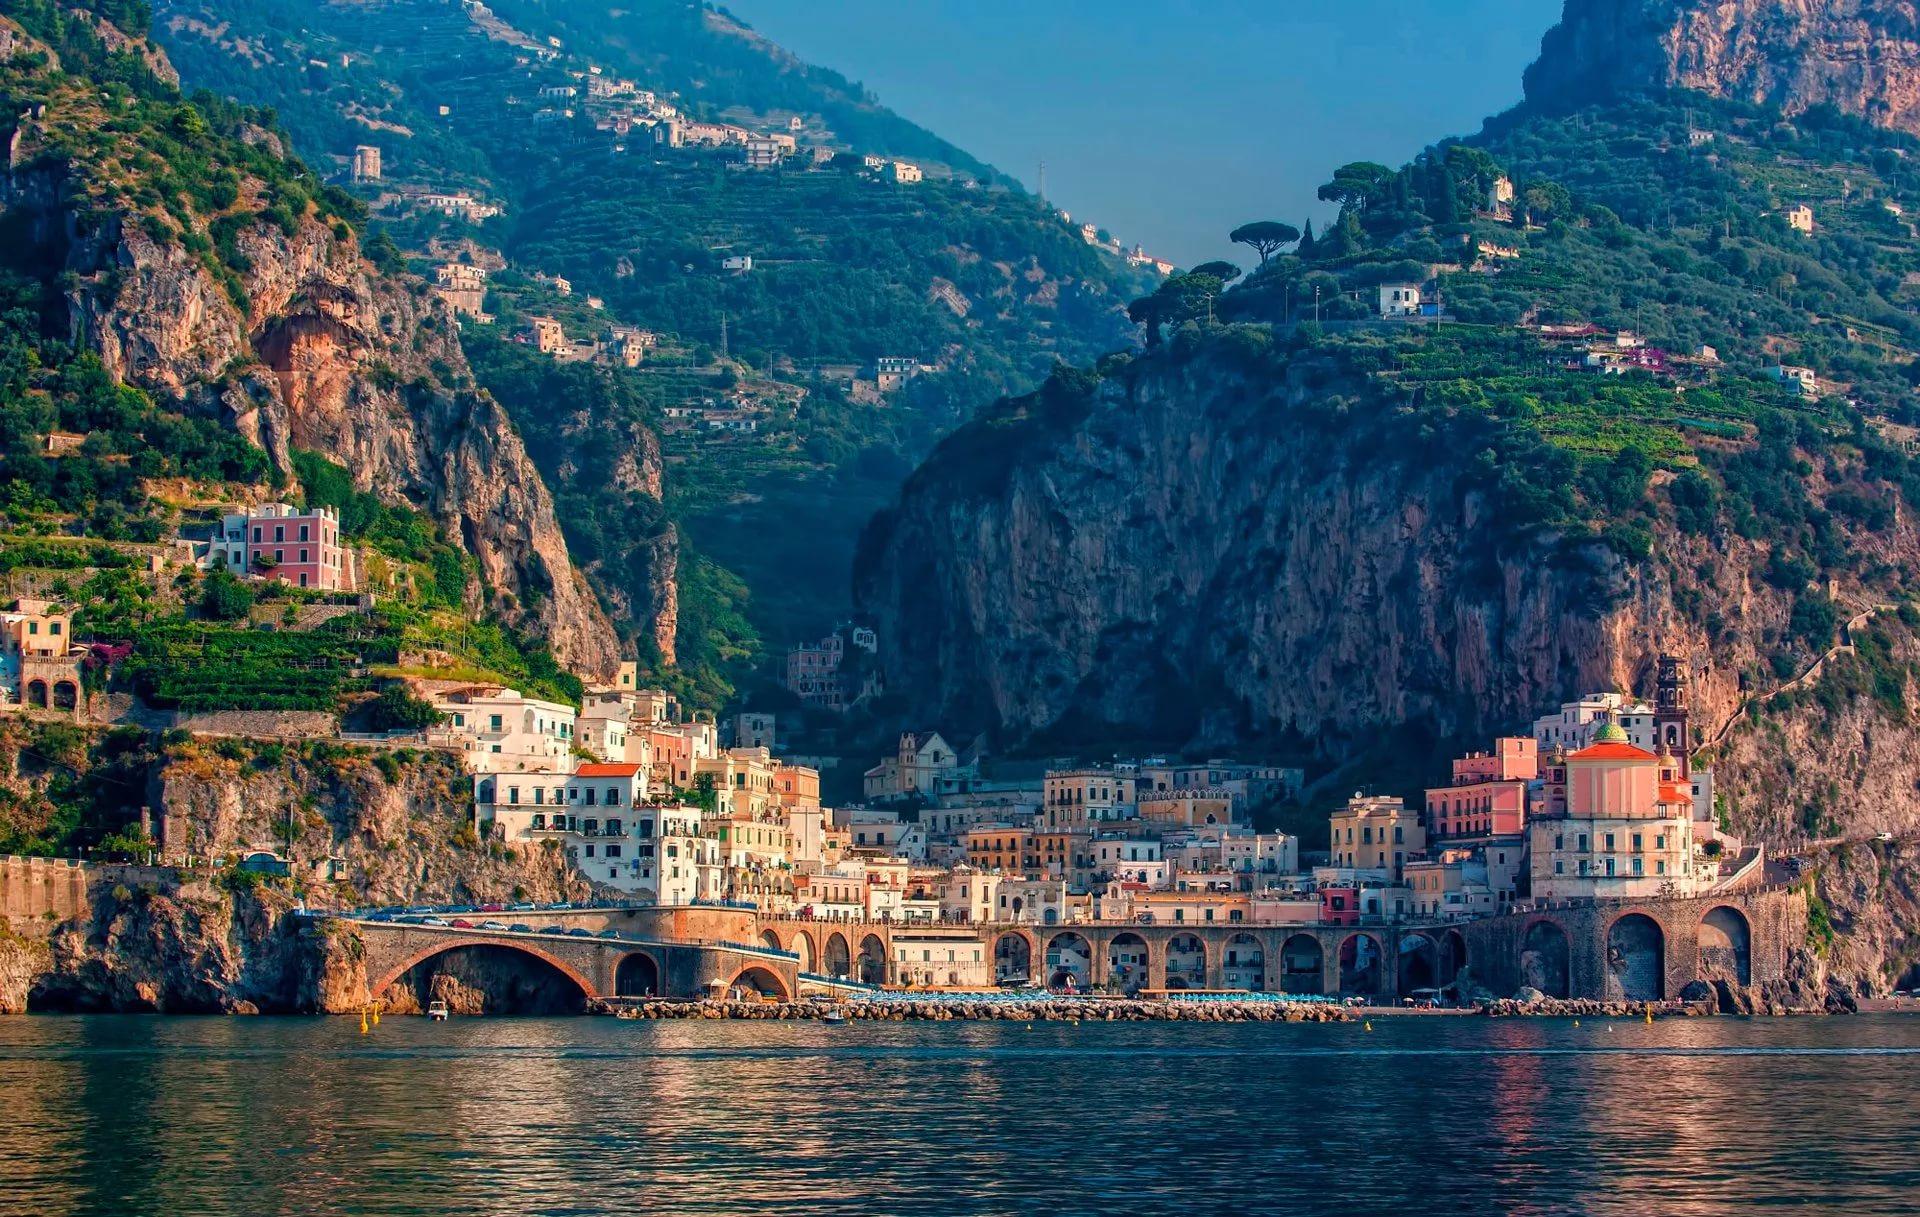 Маршрут путешествий по Италии на автомобиле